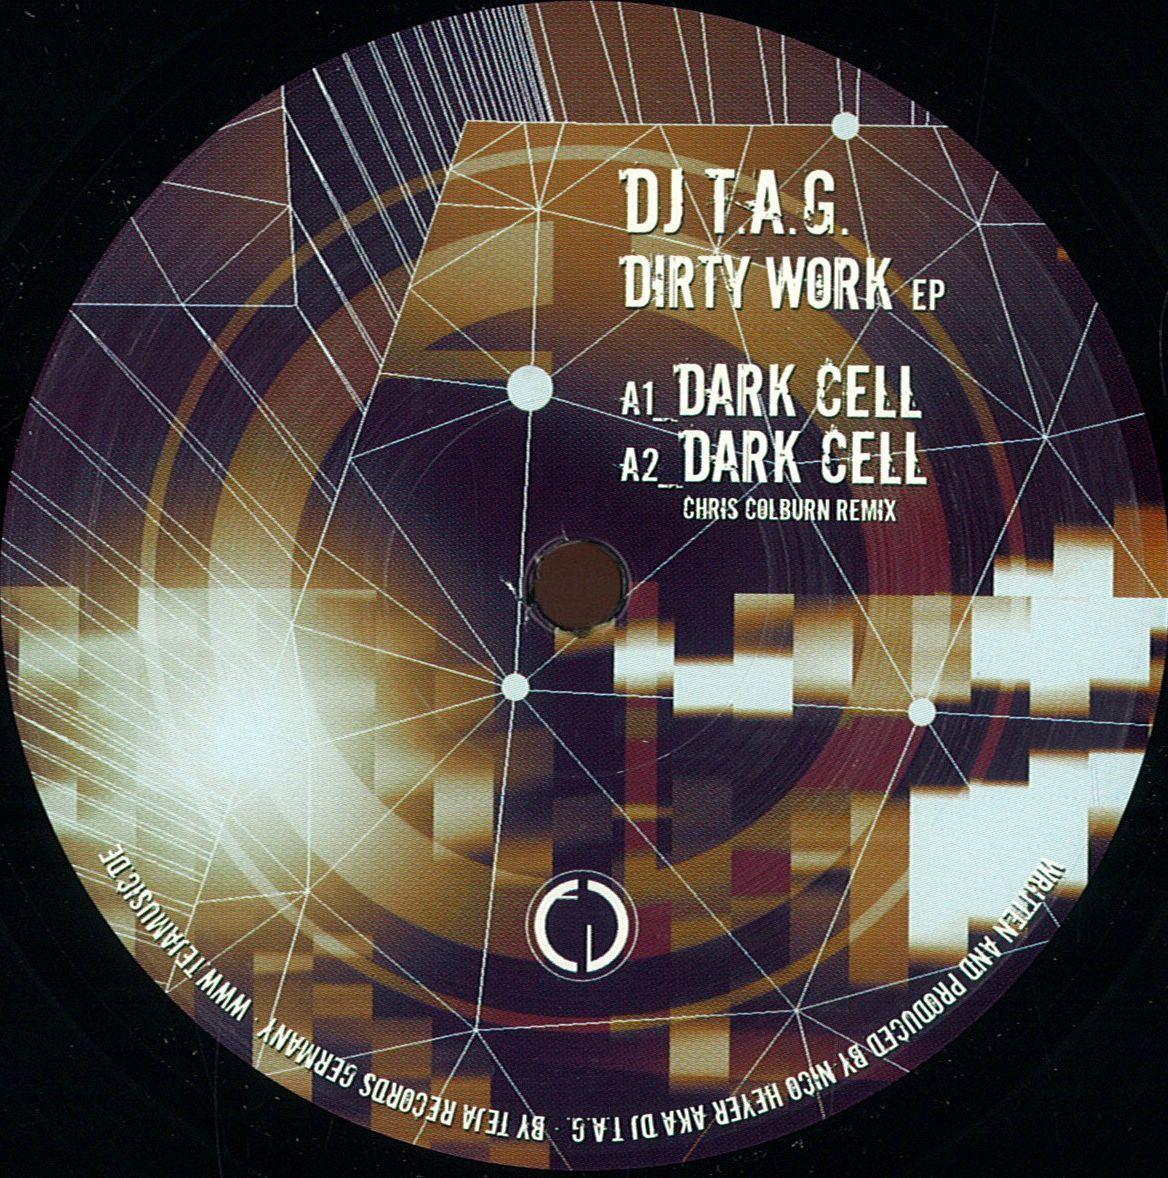 DJ T.A.G. – Dirty Work E.P. (Teja)